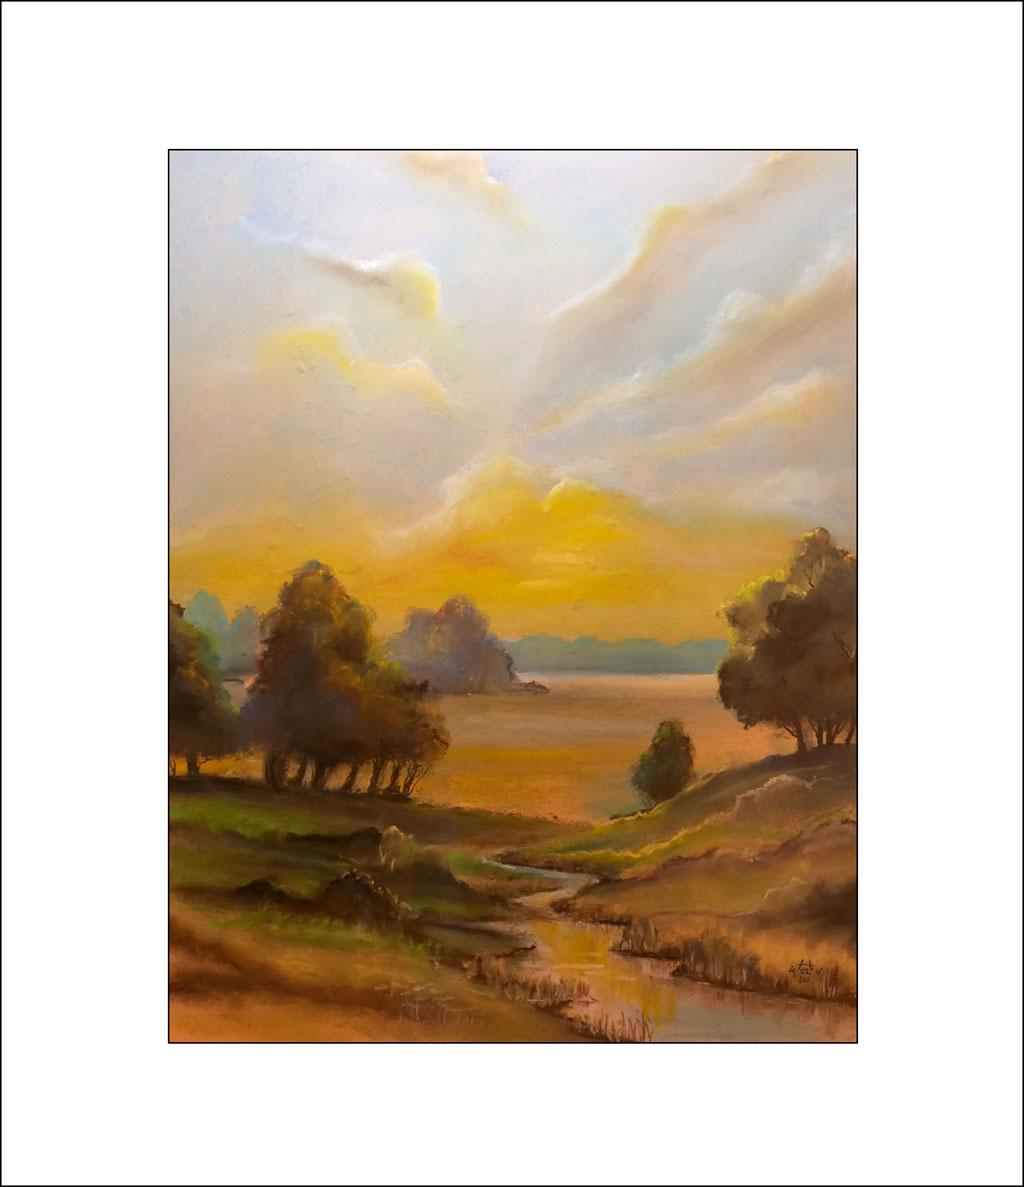 2018 Nr. 240 Auenlandschaft – 50 x 70 cm (Nr. 240)